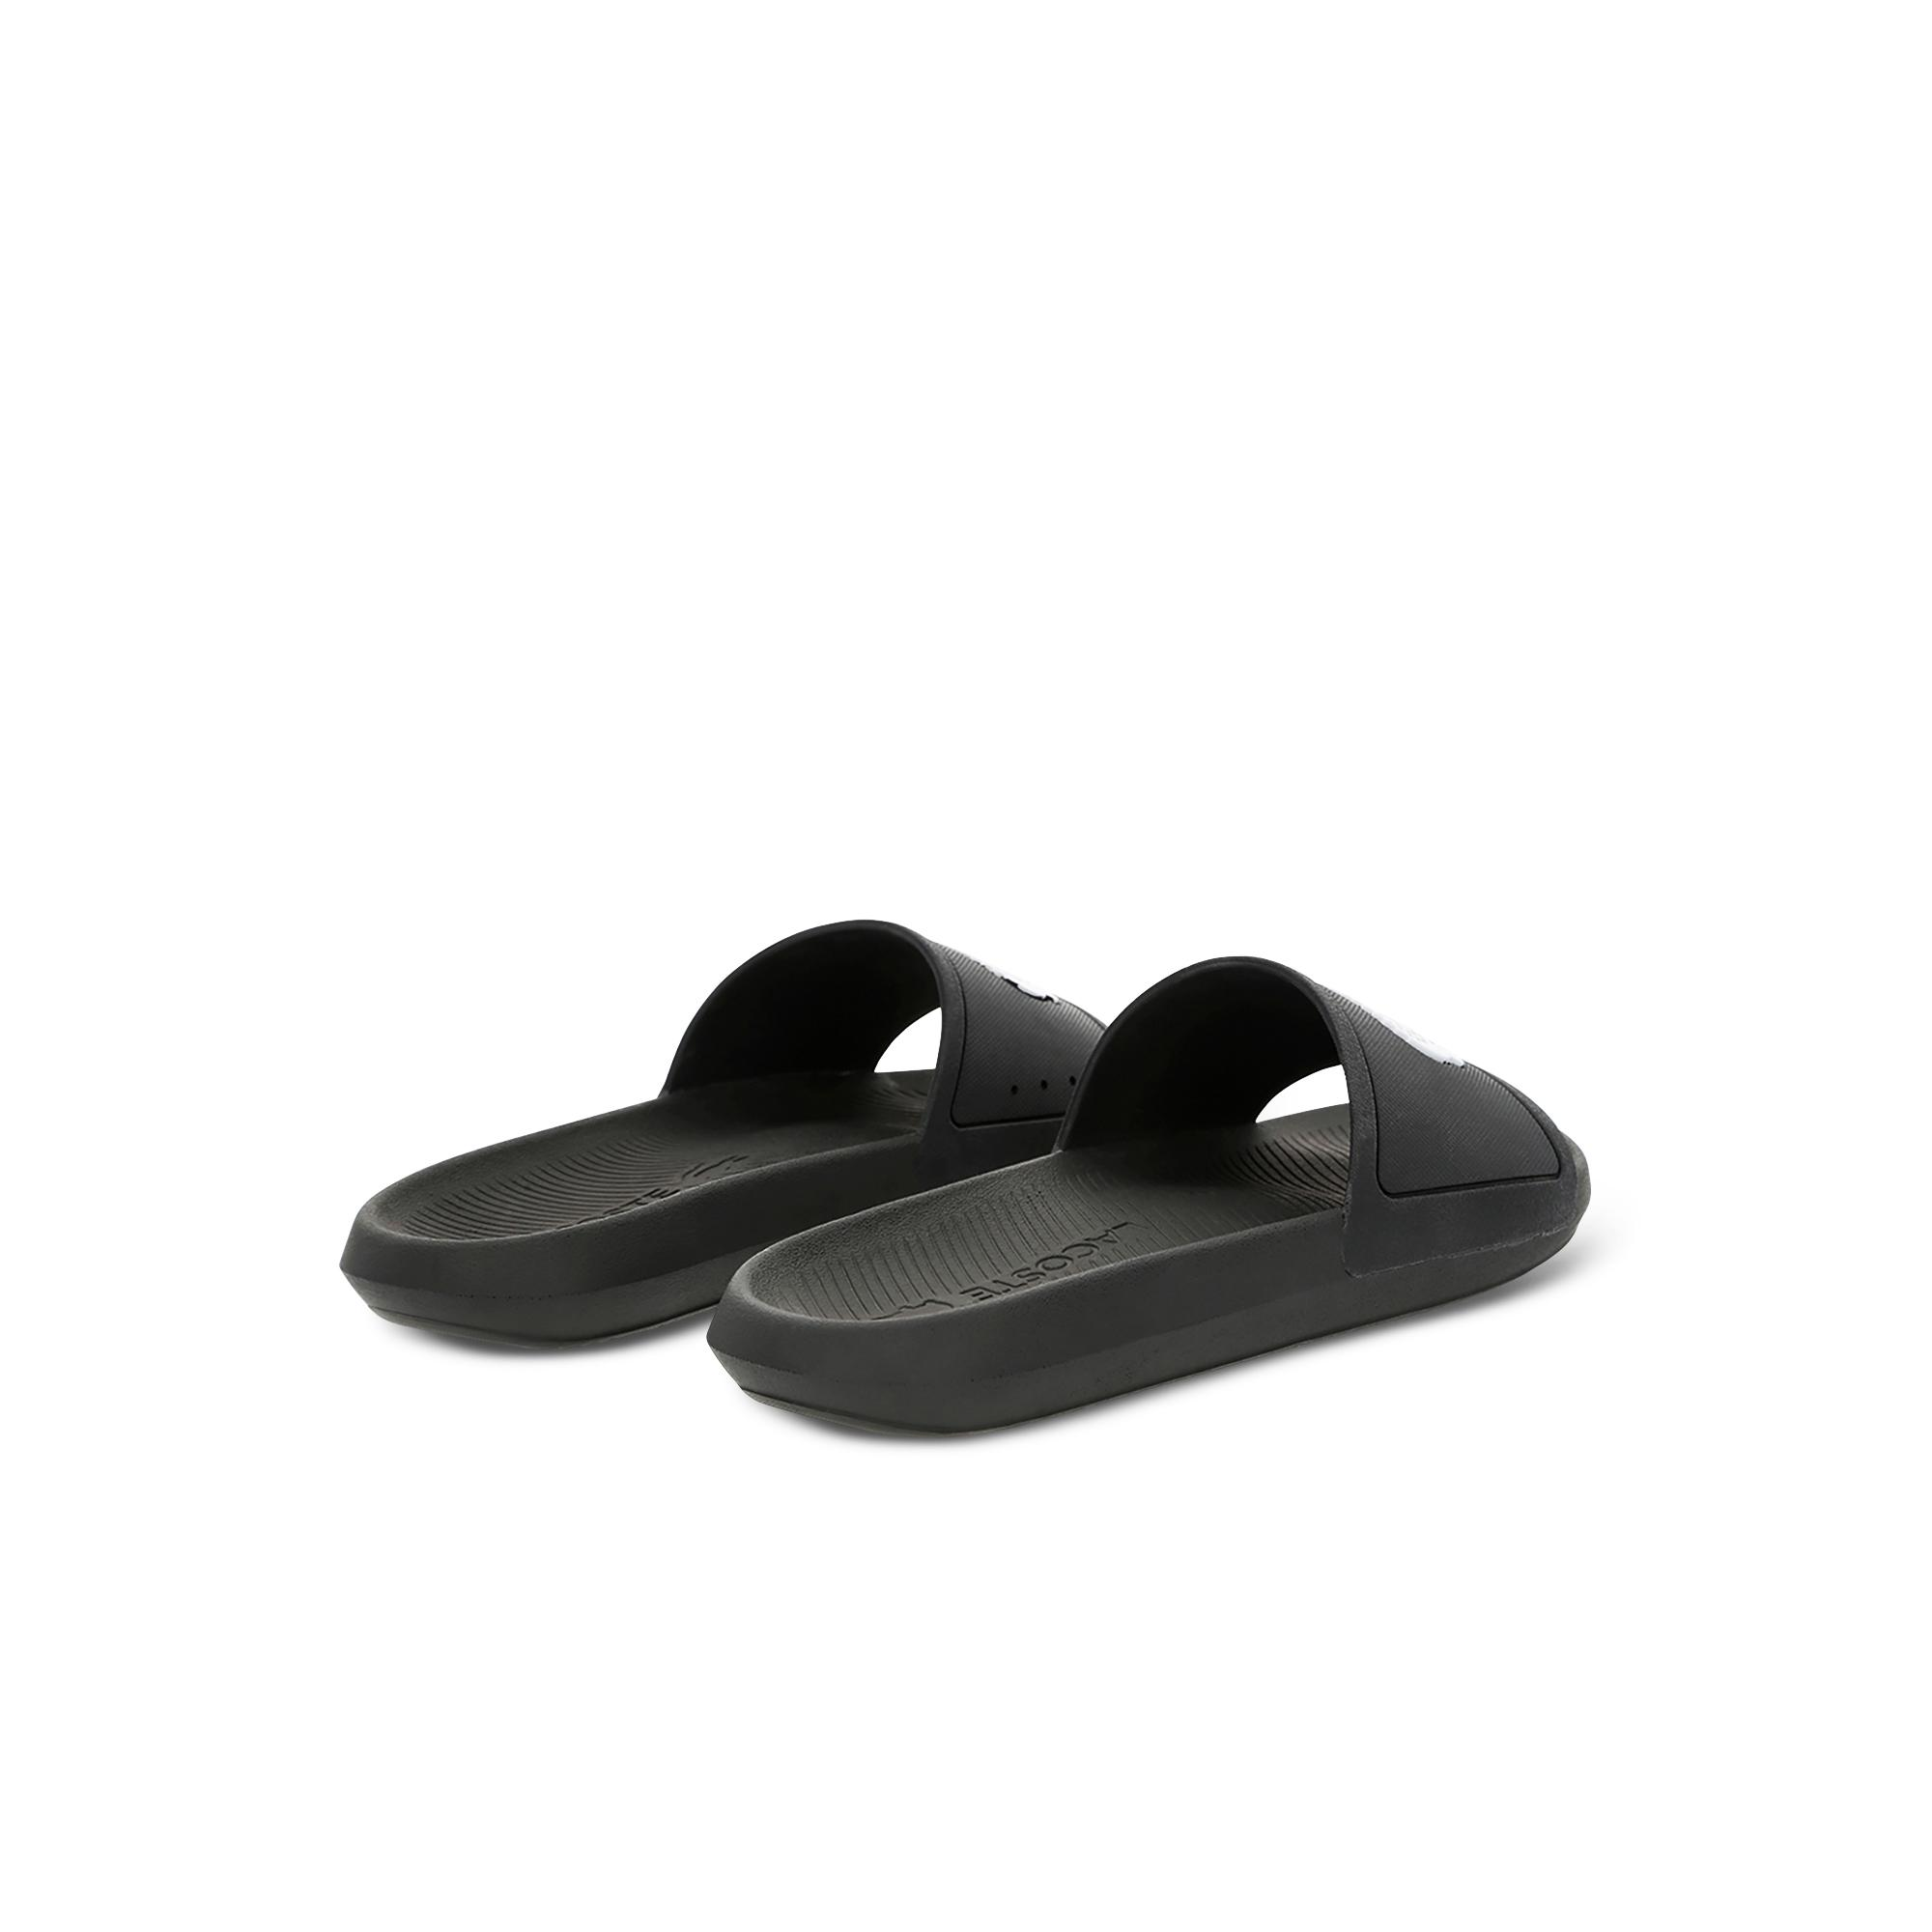 Lacoste Croco Slide 119 1 Cma Erkek Siyah - Beyaz Terlik